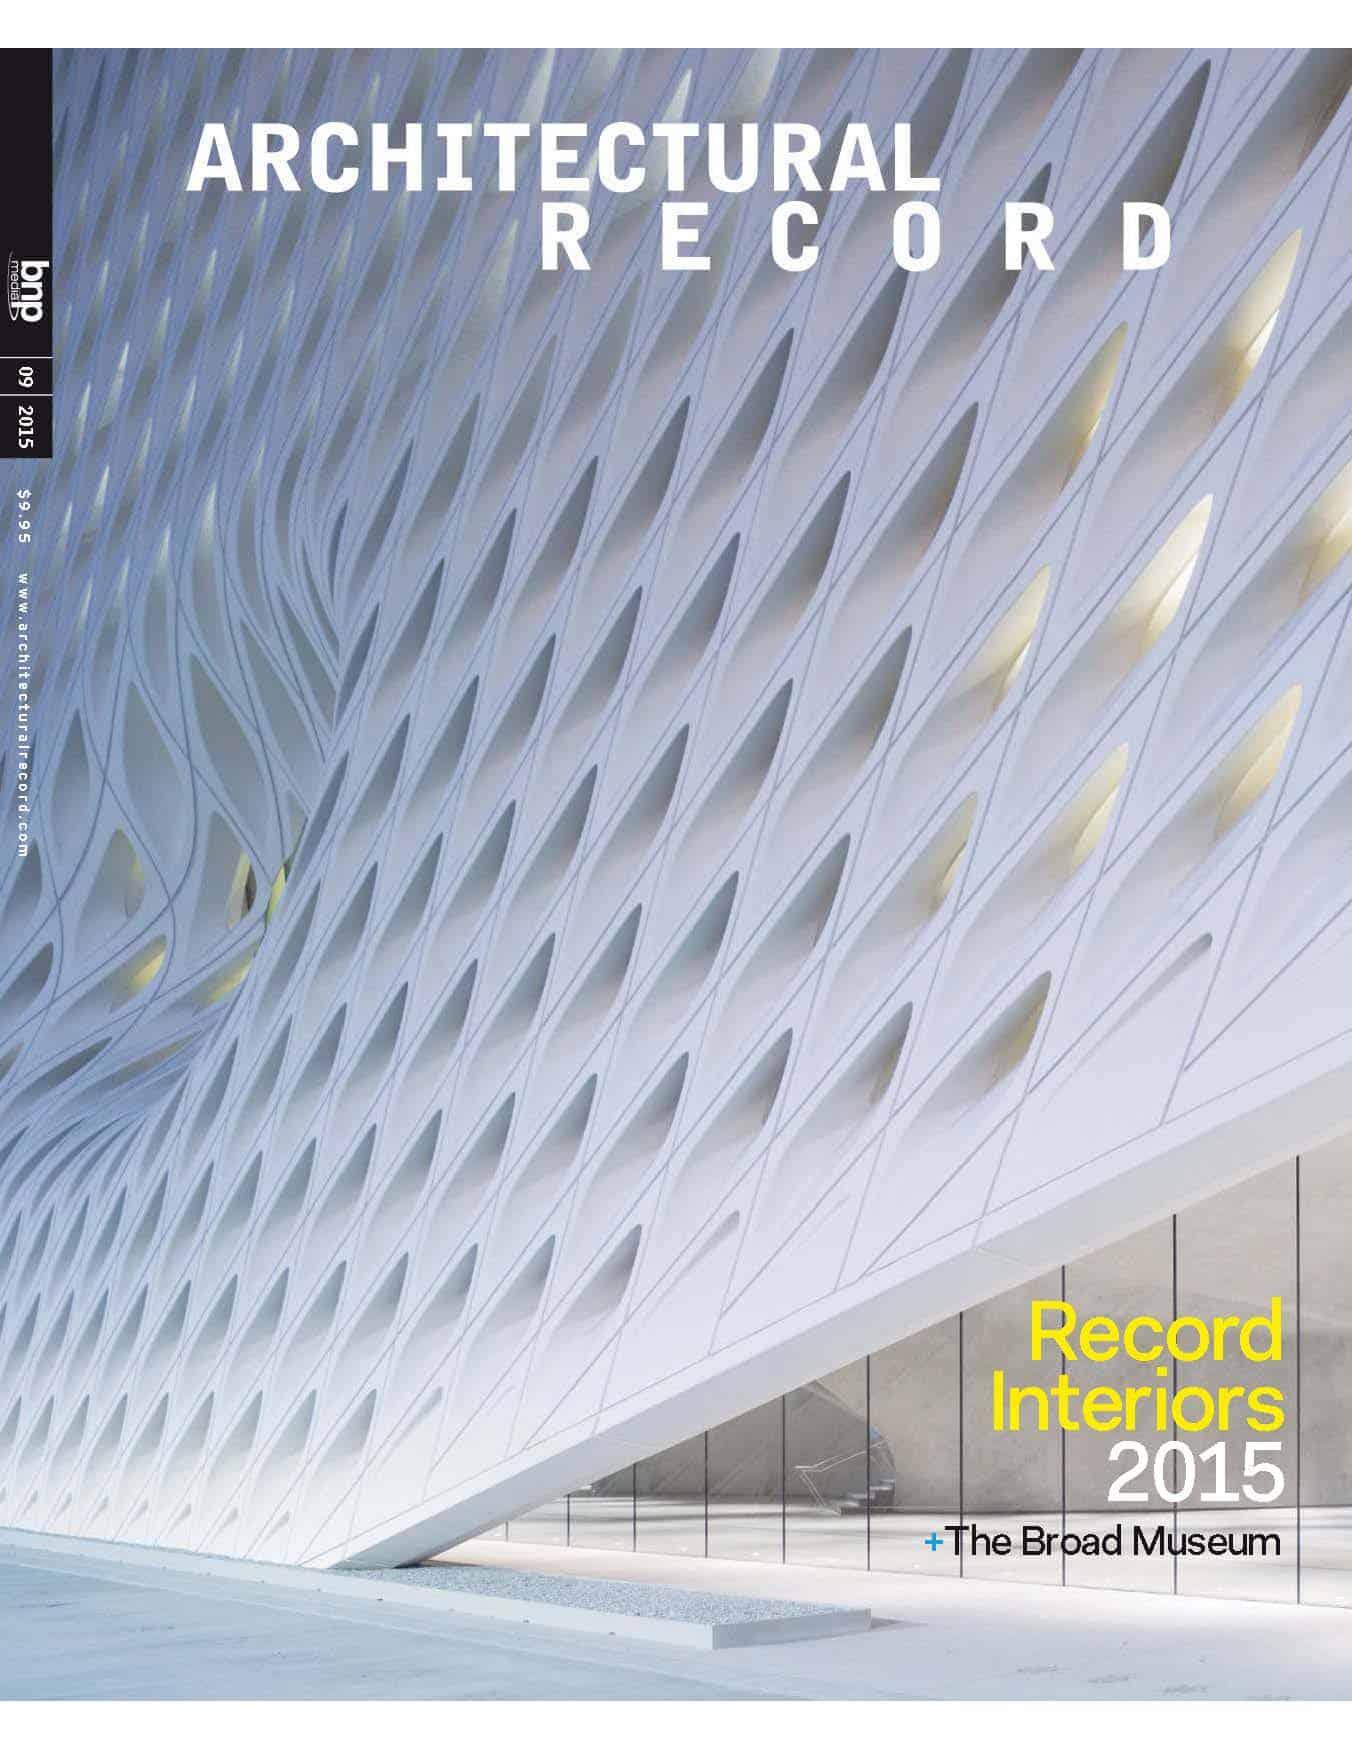 , Press & Awards, Intexure Architects